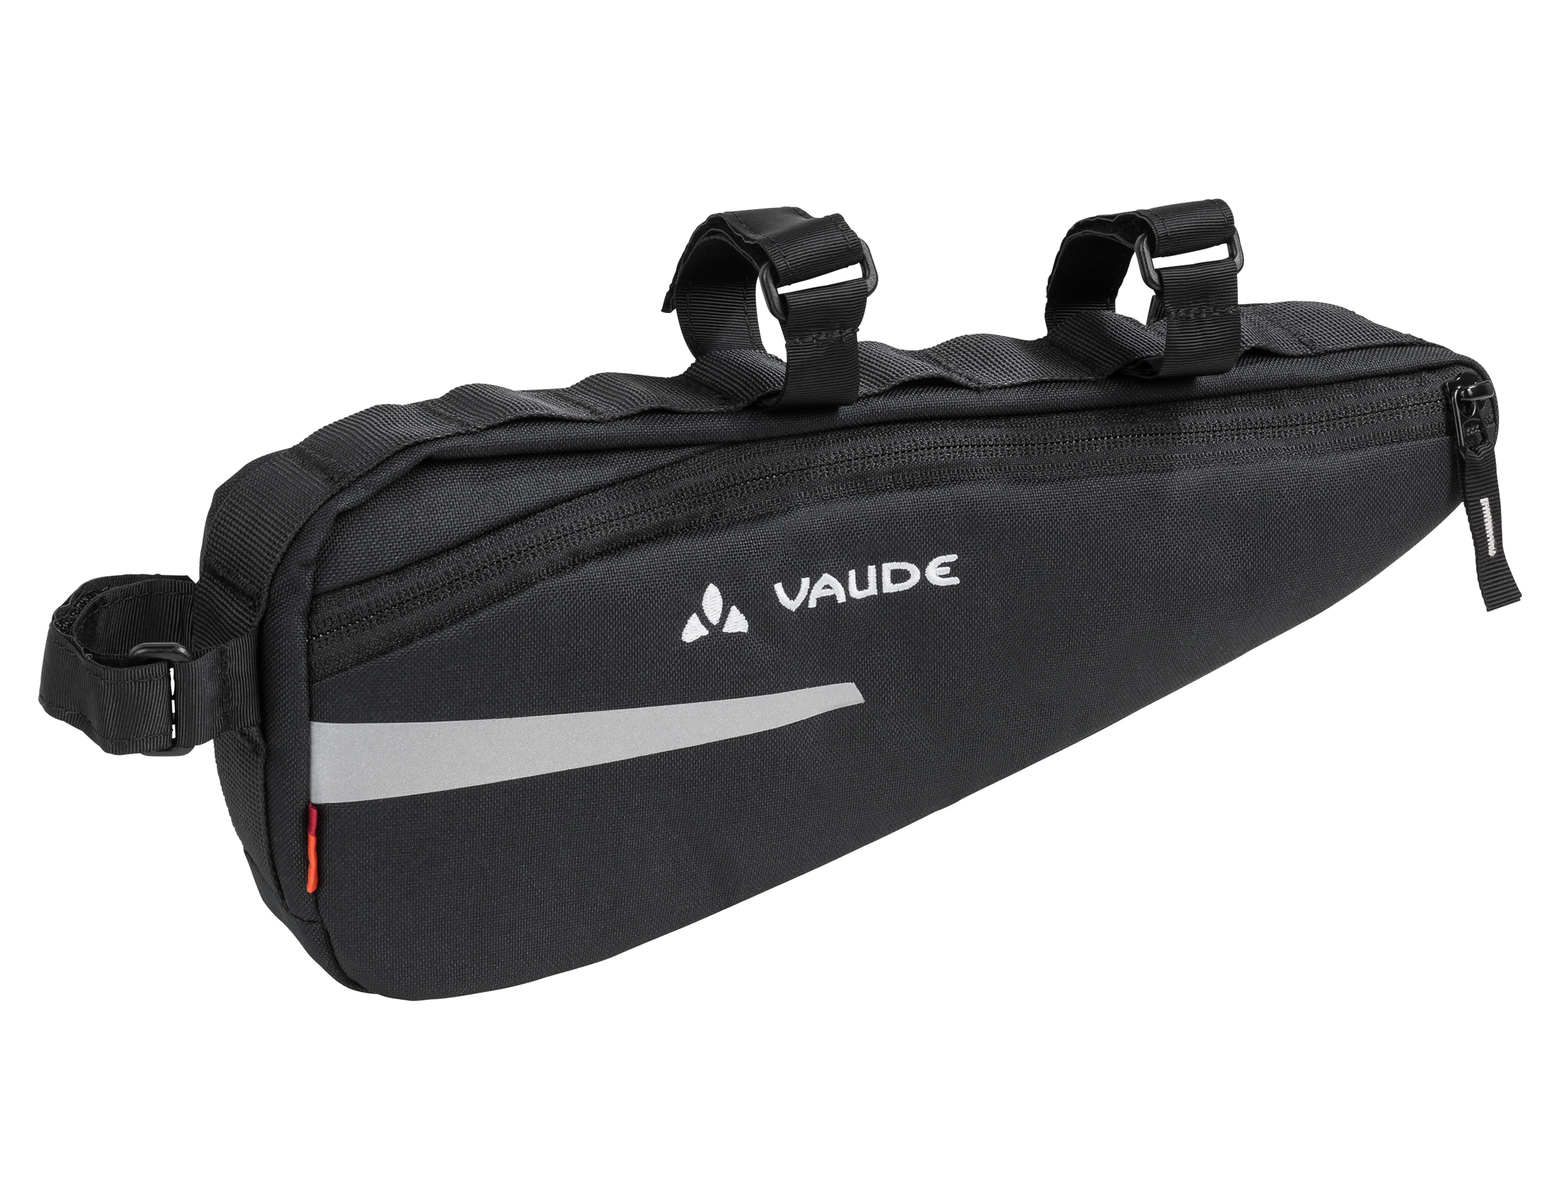 VAUDE Cruiser Bag black  - 2-Rad-Sport Wehrle